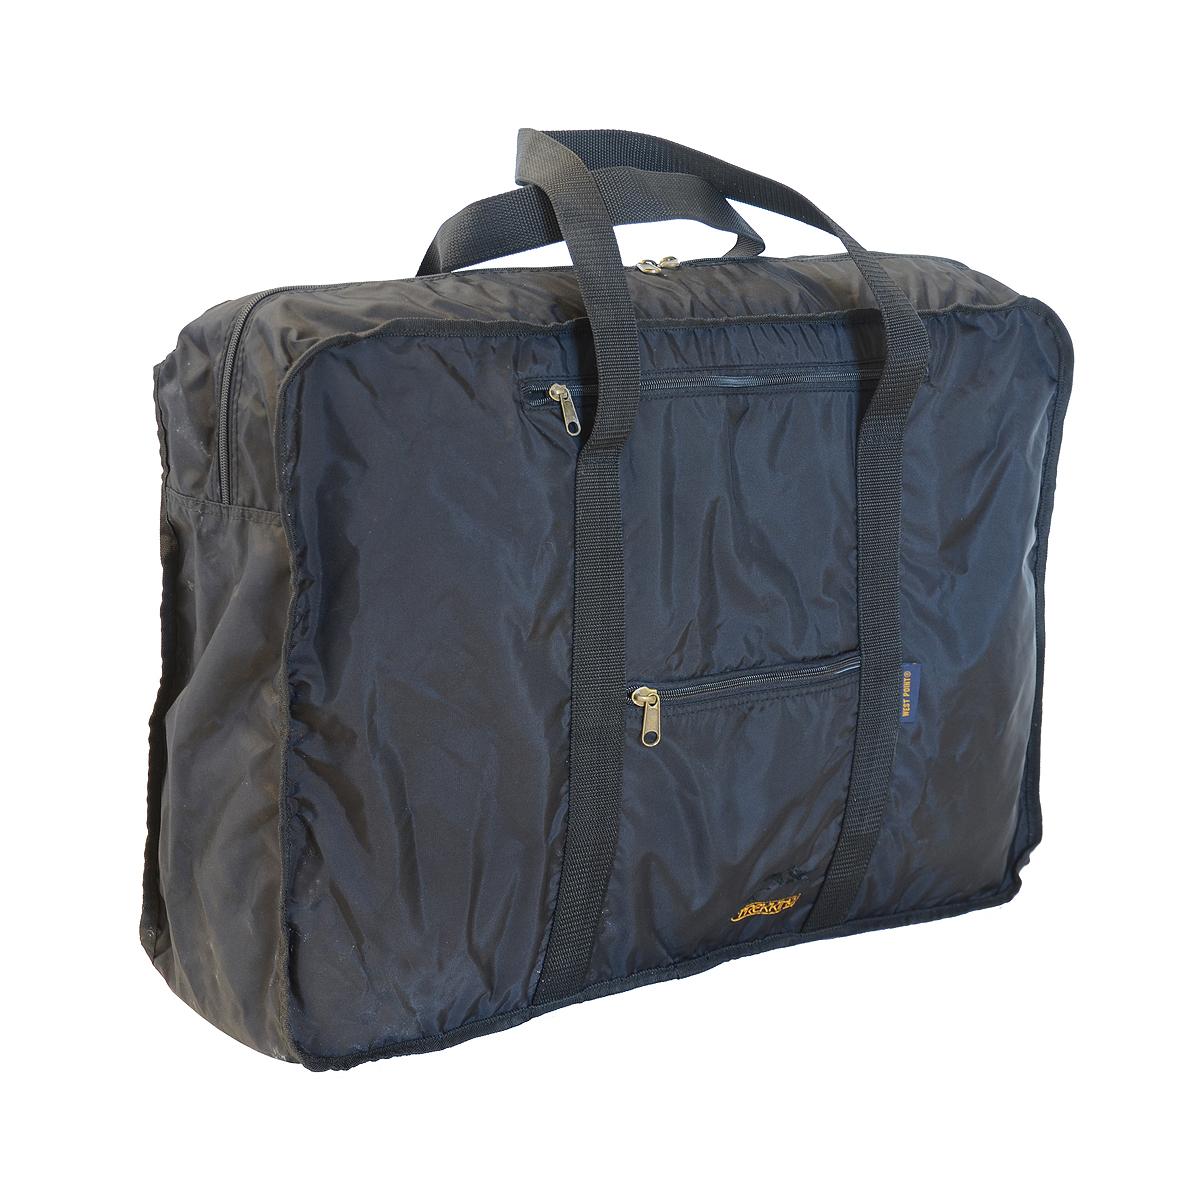 sac de voyage pliable en nylon boutique trekking. Black Bedroom Furniture Sets. Home Design Ideas